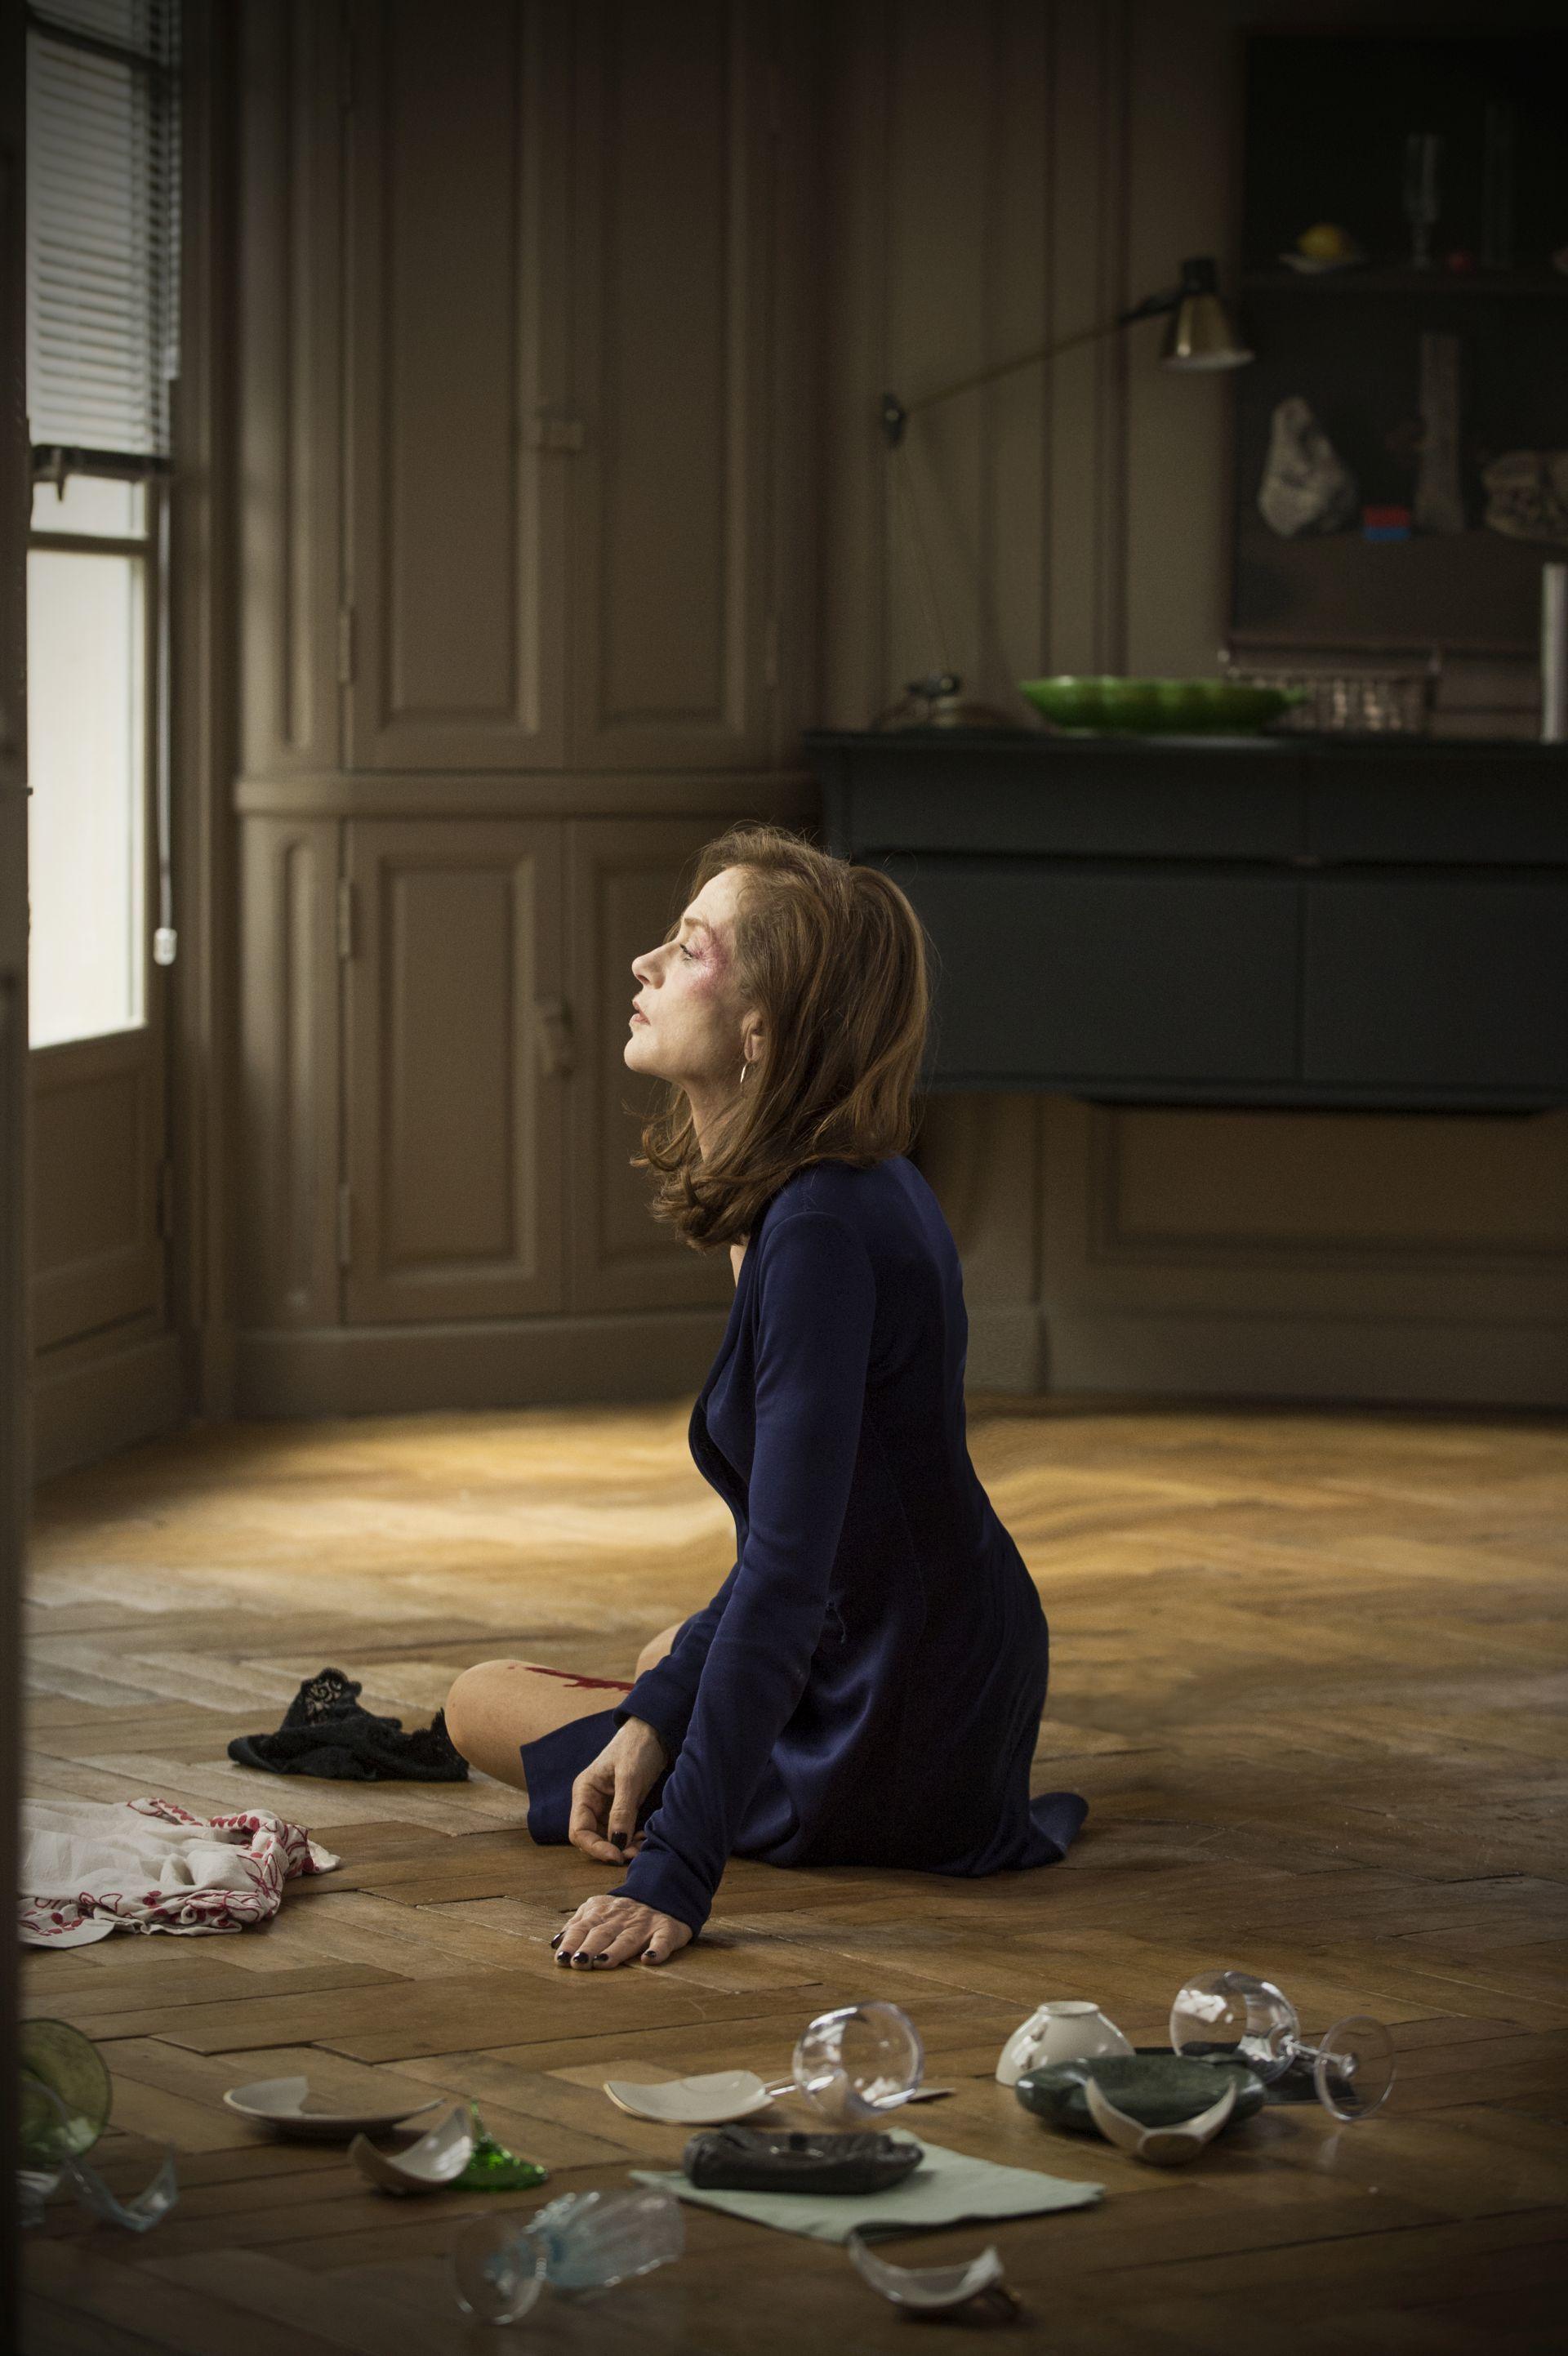 2015 SBS PRODUCTIONS – SBS FILMS– TWENTY TWENTY VISION FILMPRODUKTION – FRANCE 2 CINÉMA – ENTRE CHIEN ET LOUP